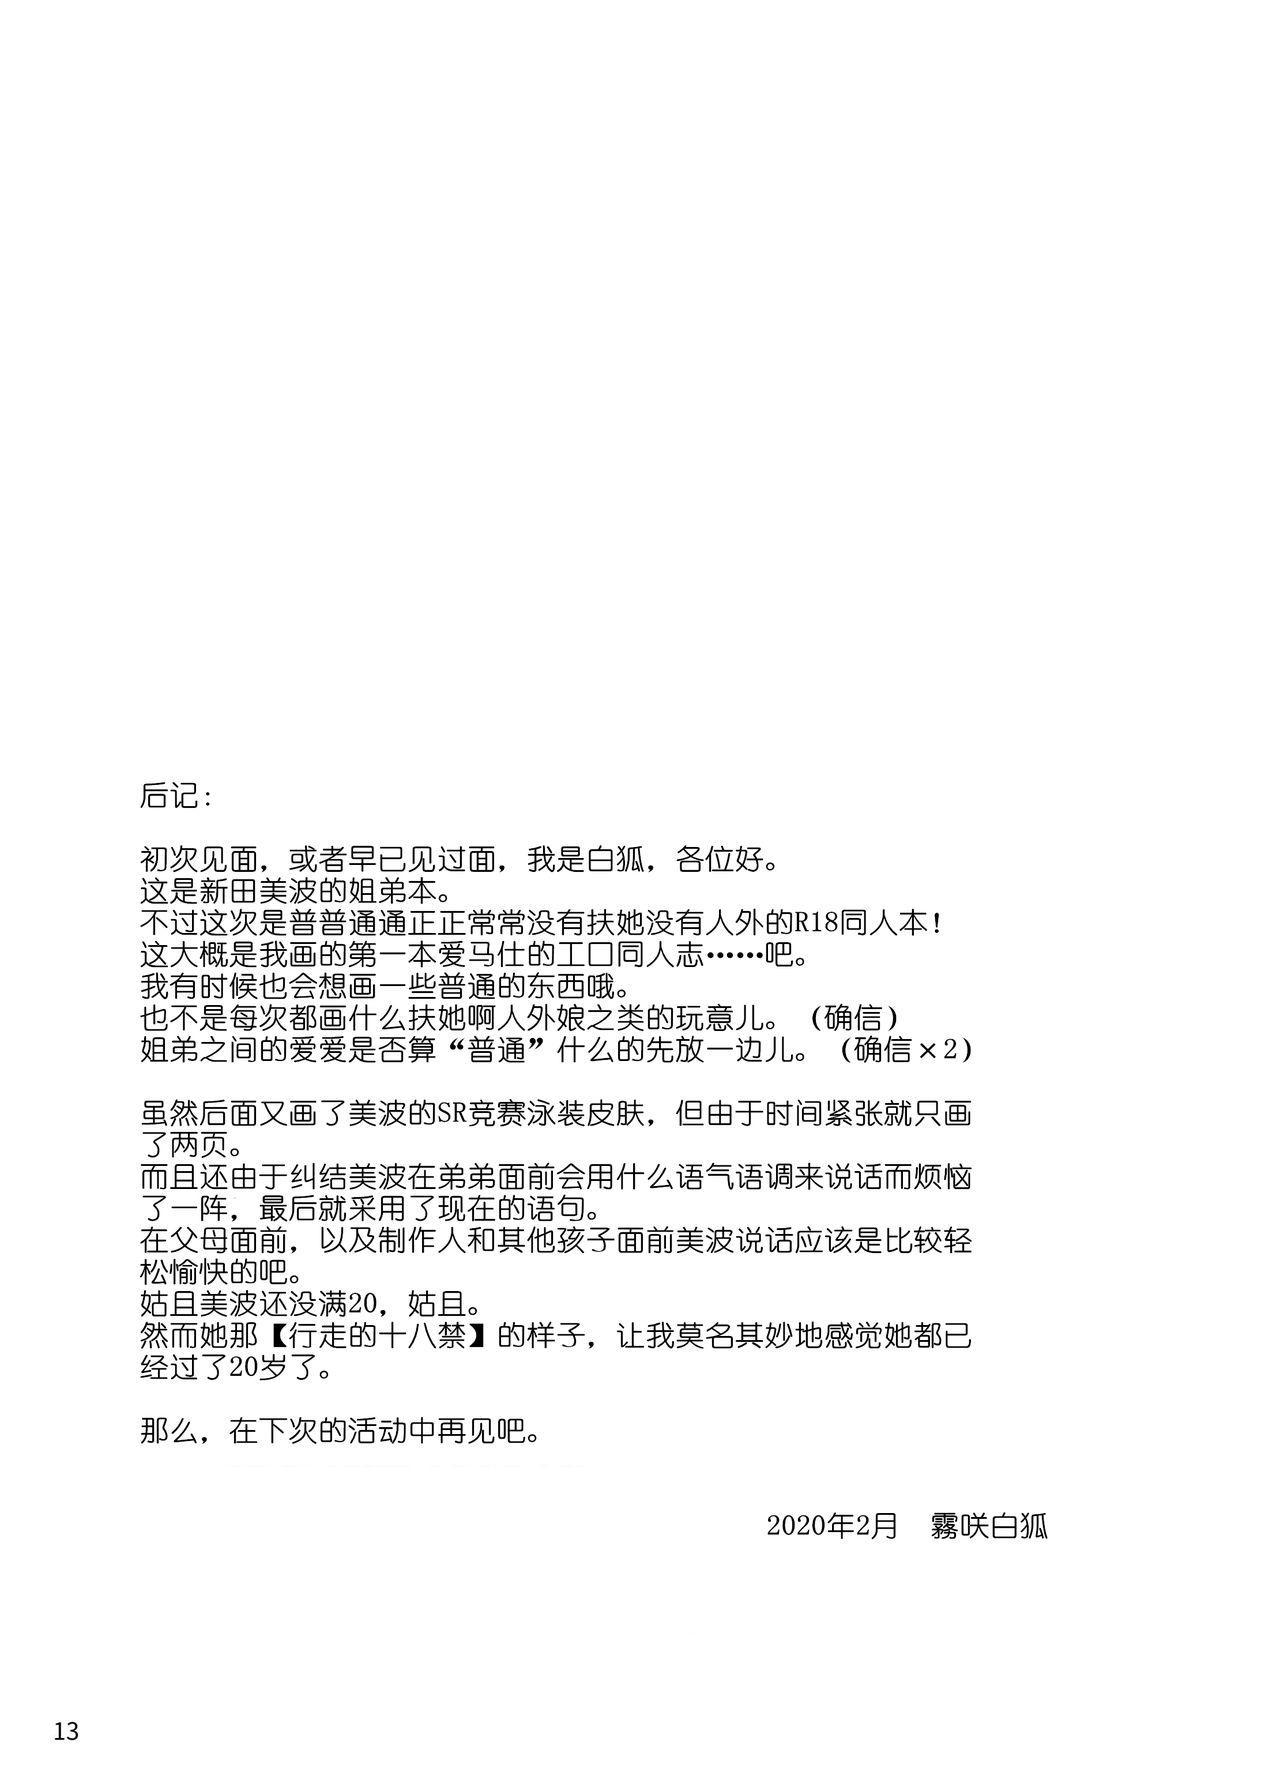 Seiyoku o Otouto de Hassan Saseru Ane | 拿弟弟发泄性欲的美波姐 13